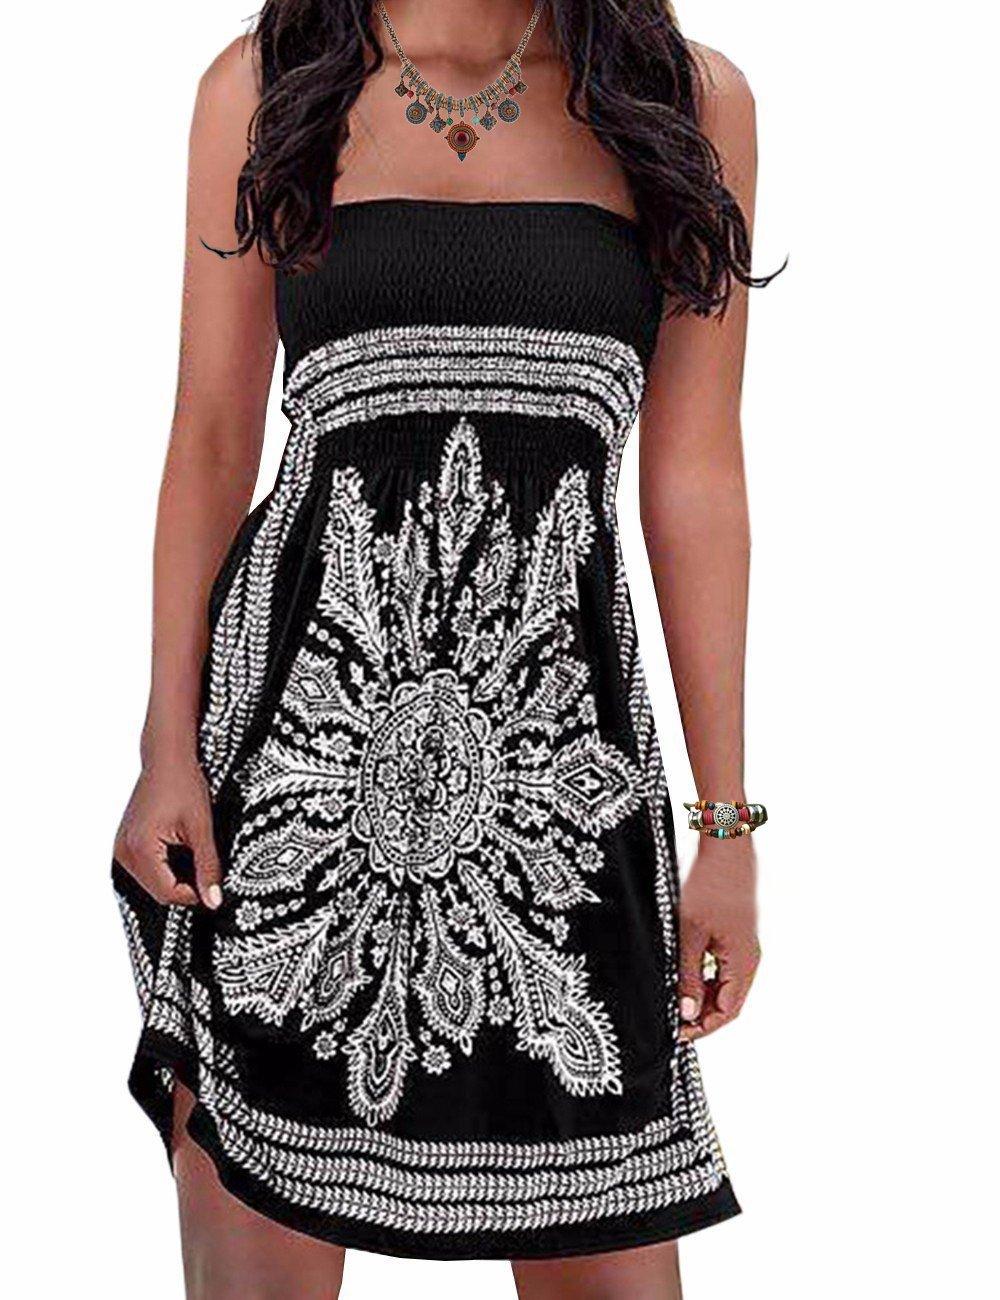 Initial Women's Coverup Dress Bohemian Beach Dress Strapleess Floral Print Cover-up Dress, Black2, Medium